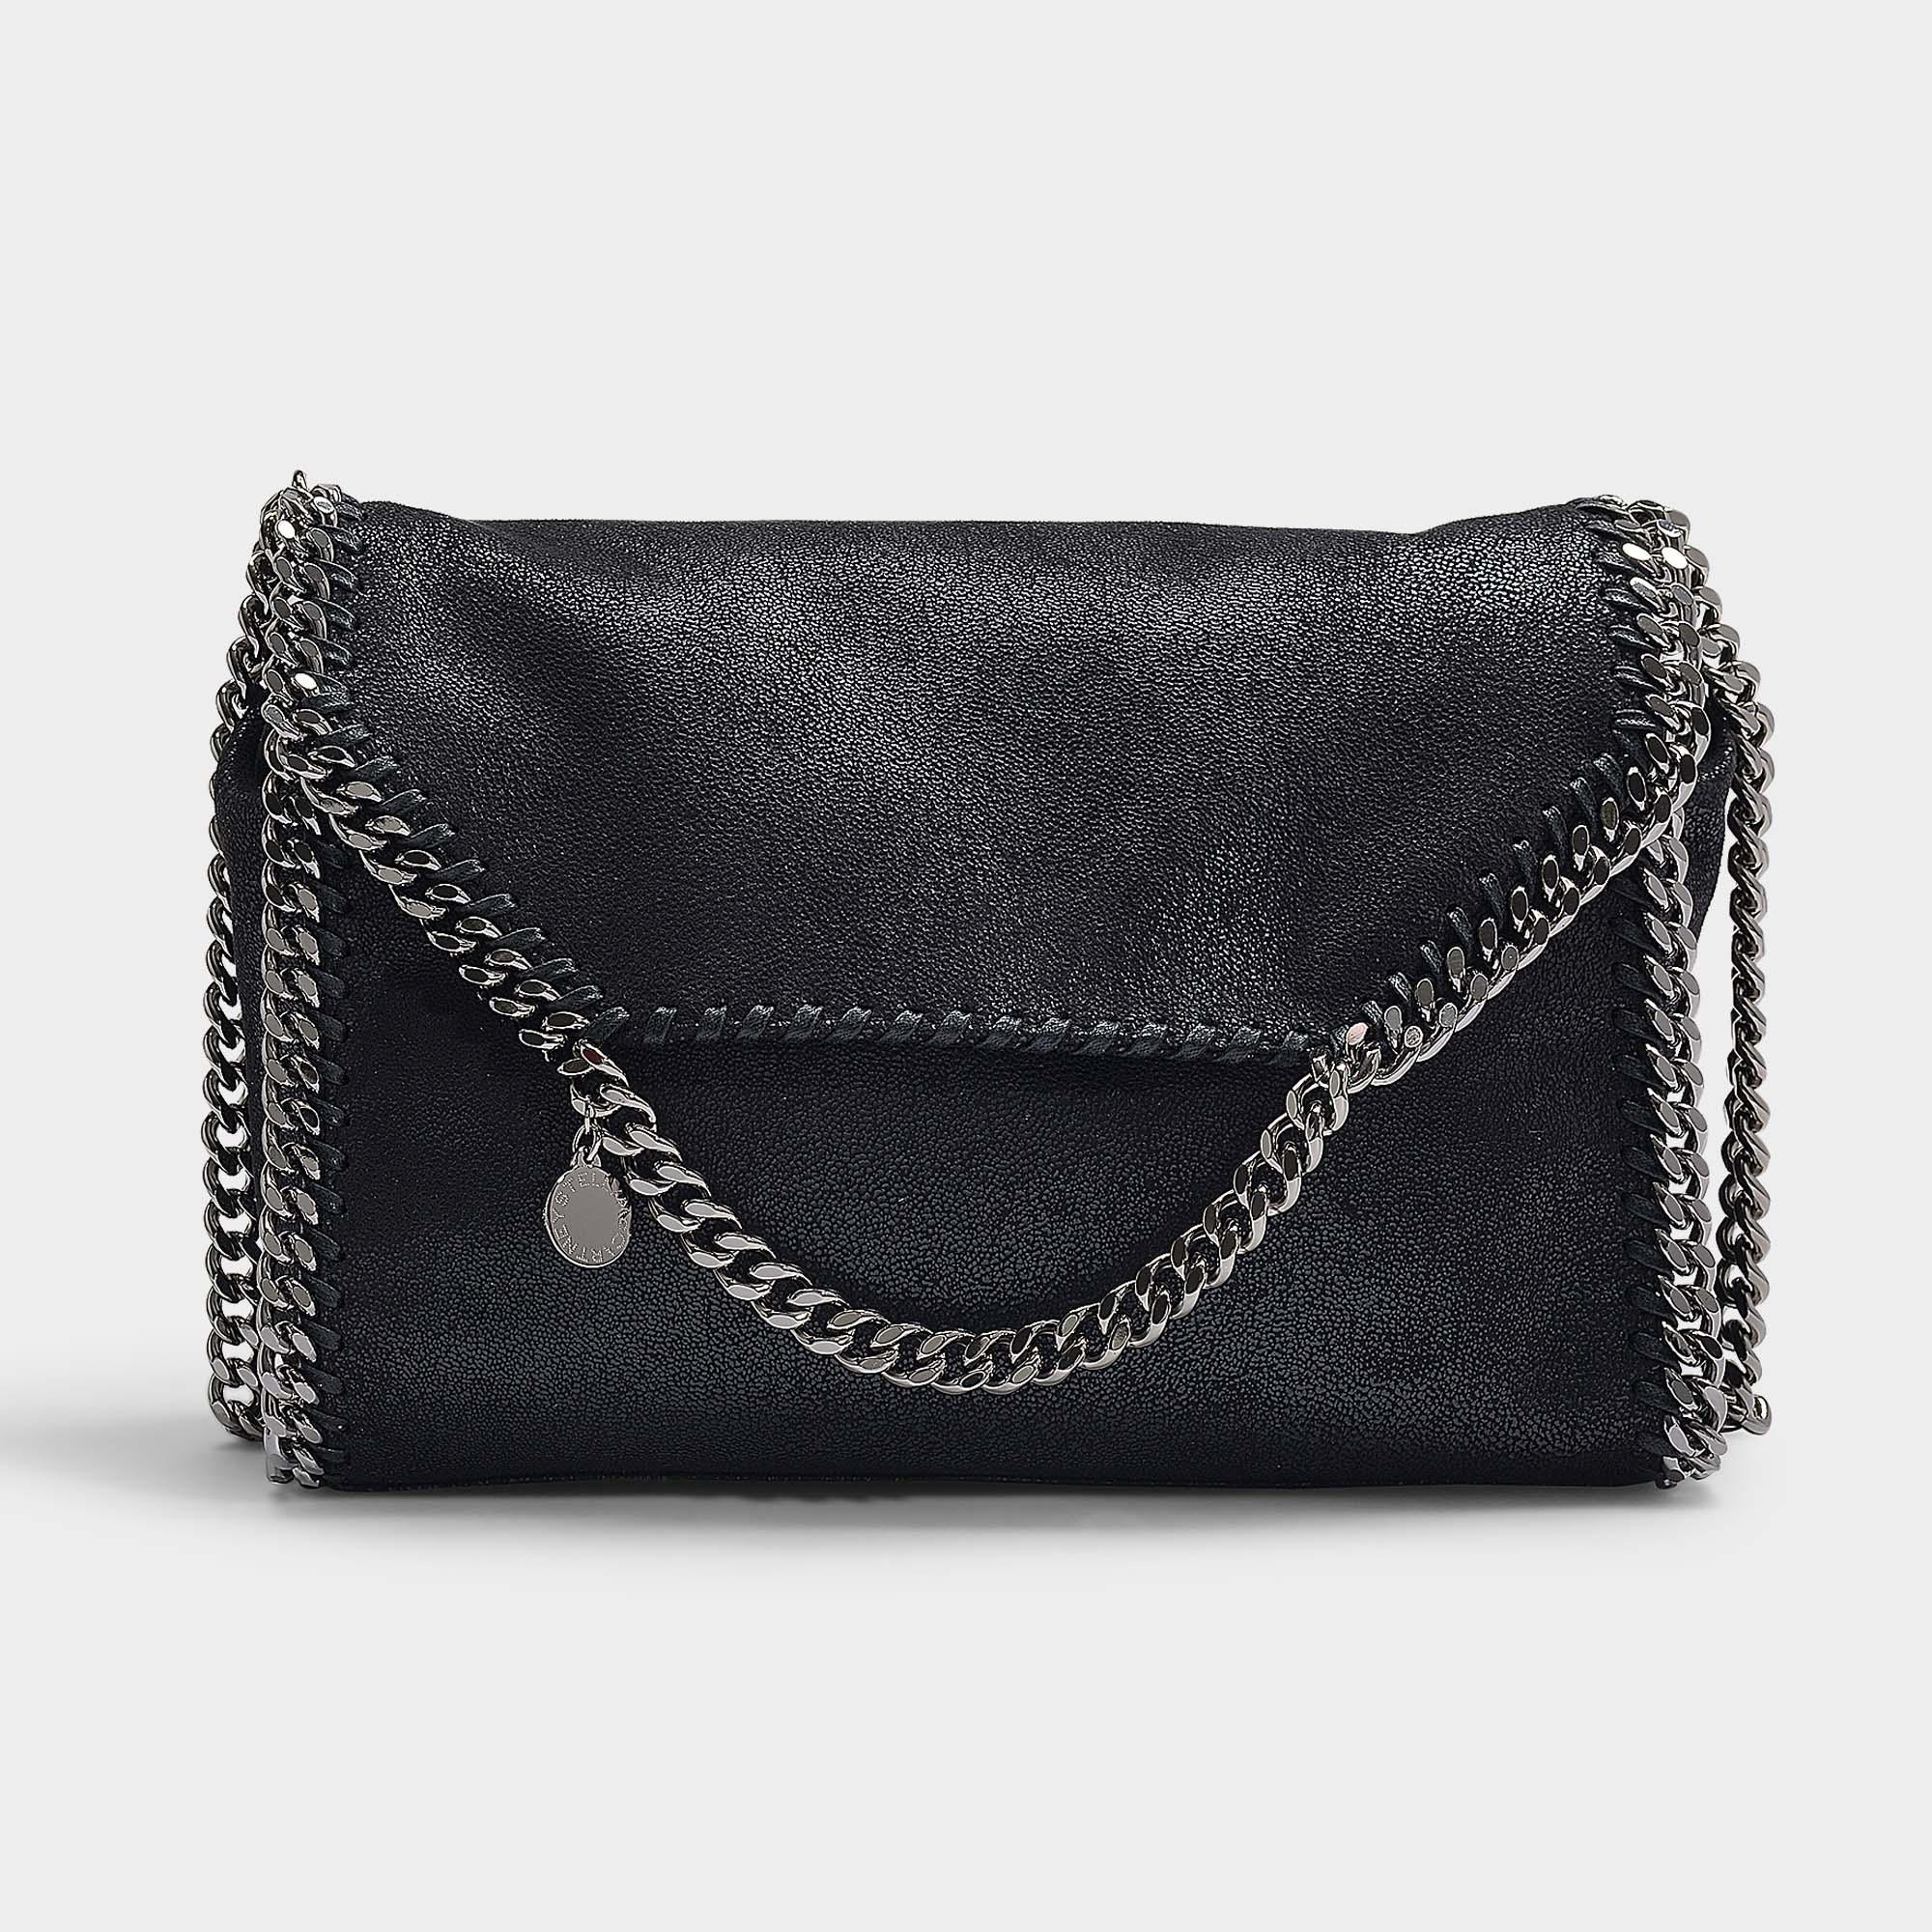 2cb834da33 Stella McCartney. Women s Falabella Big Shoulder Bag In Black Eco Leather